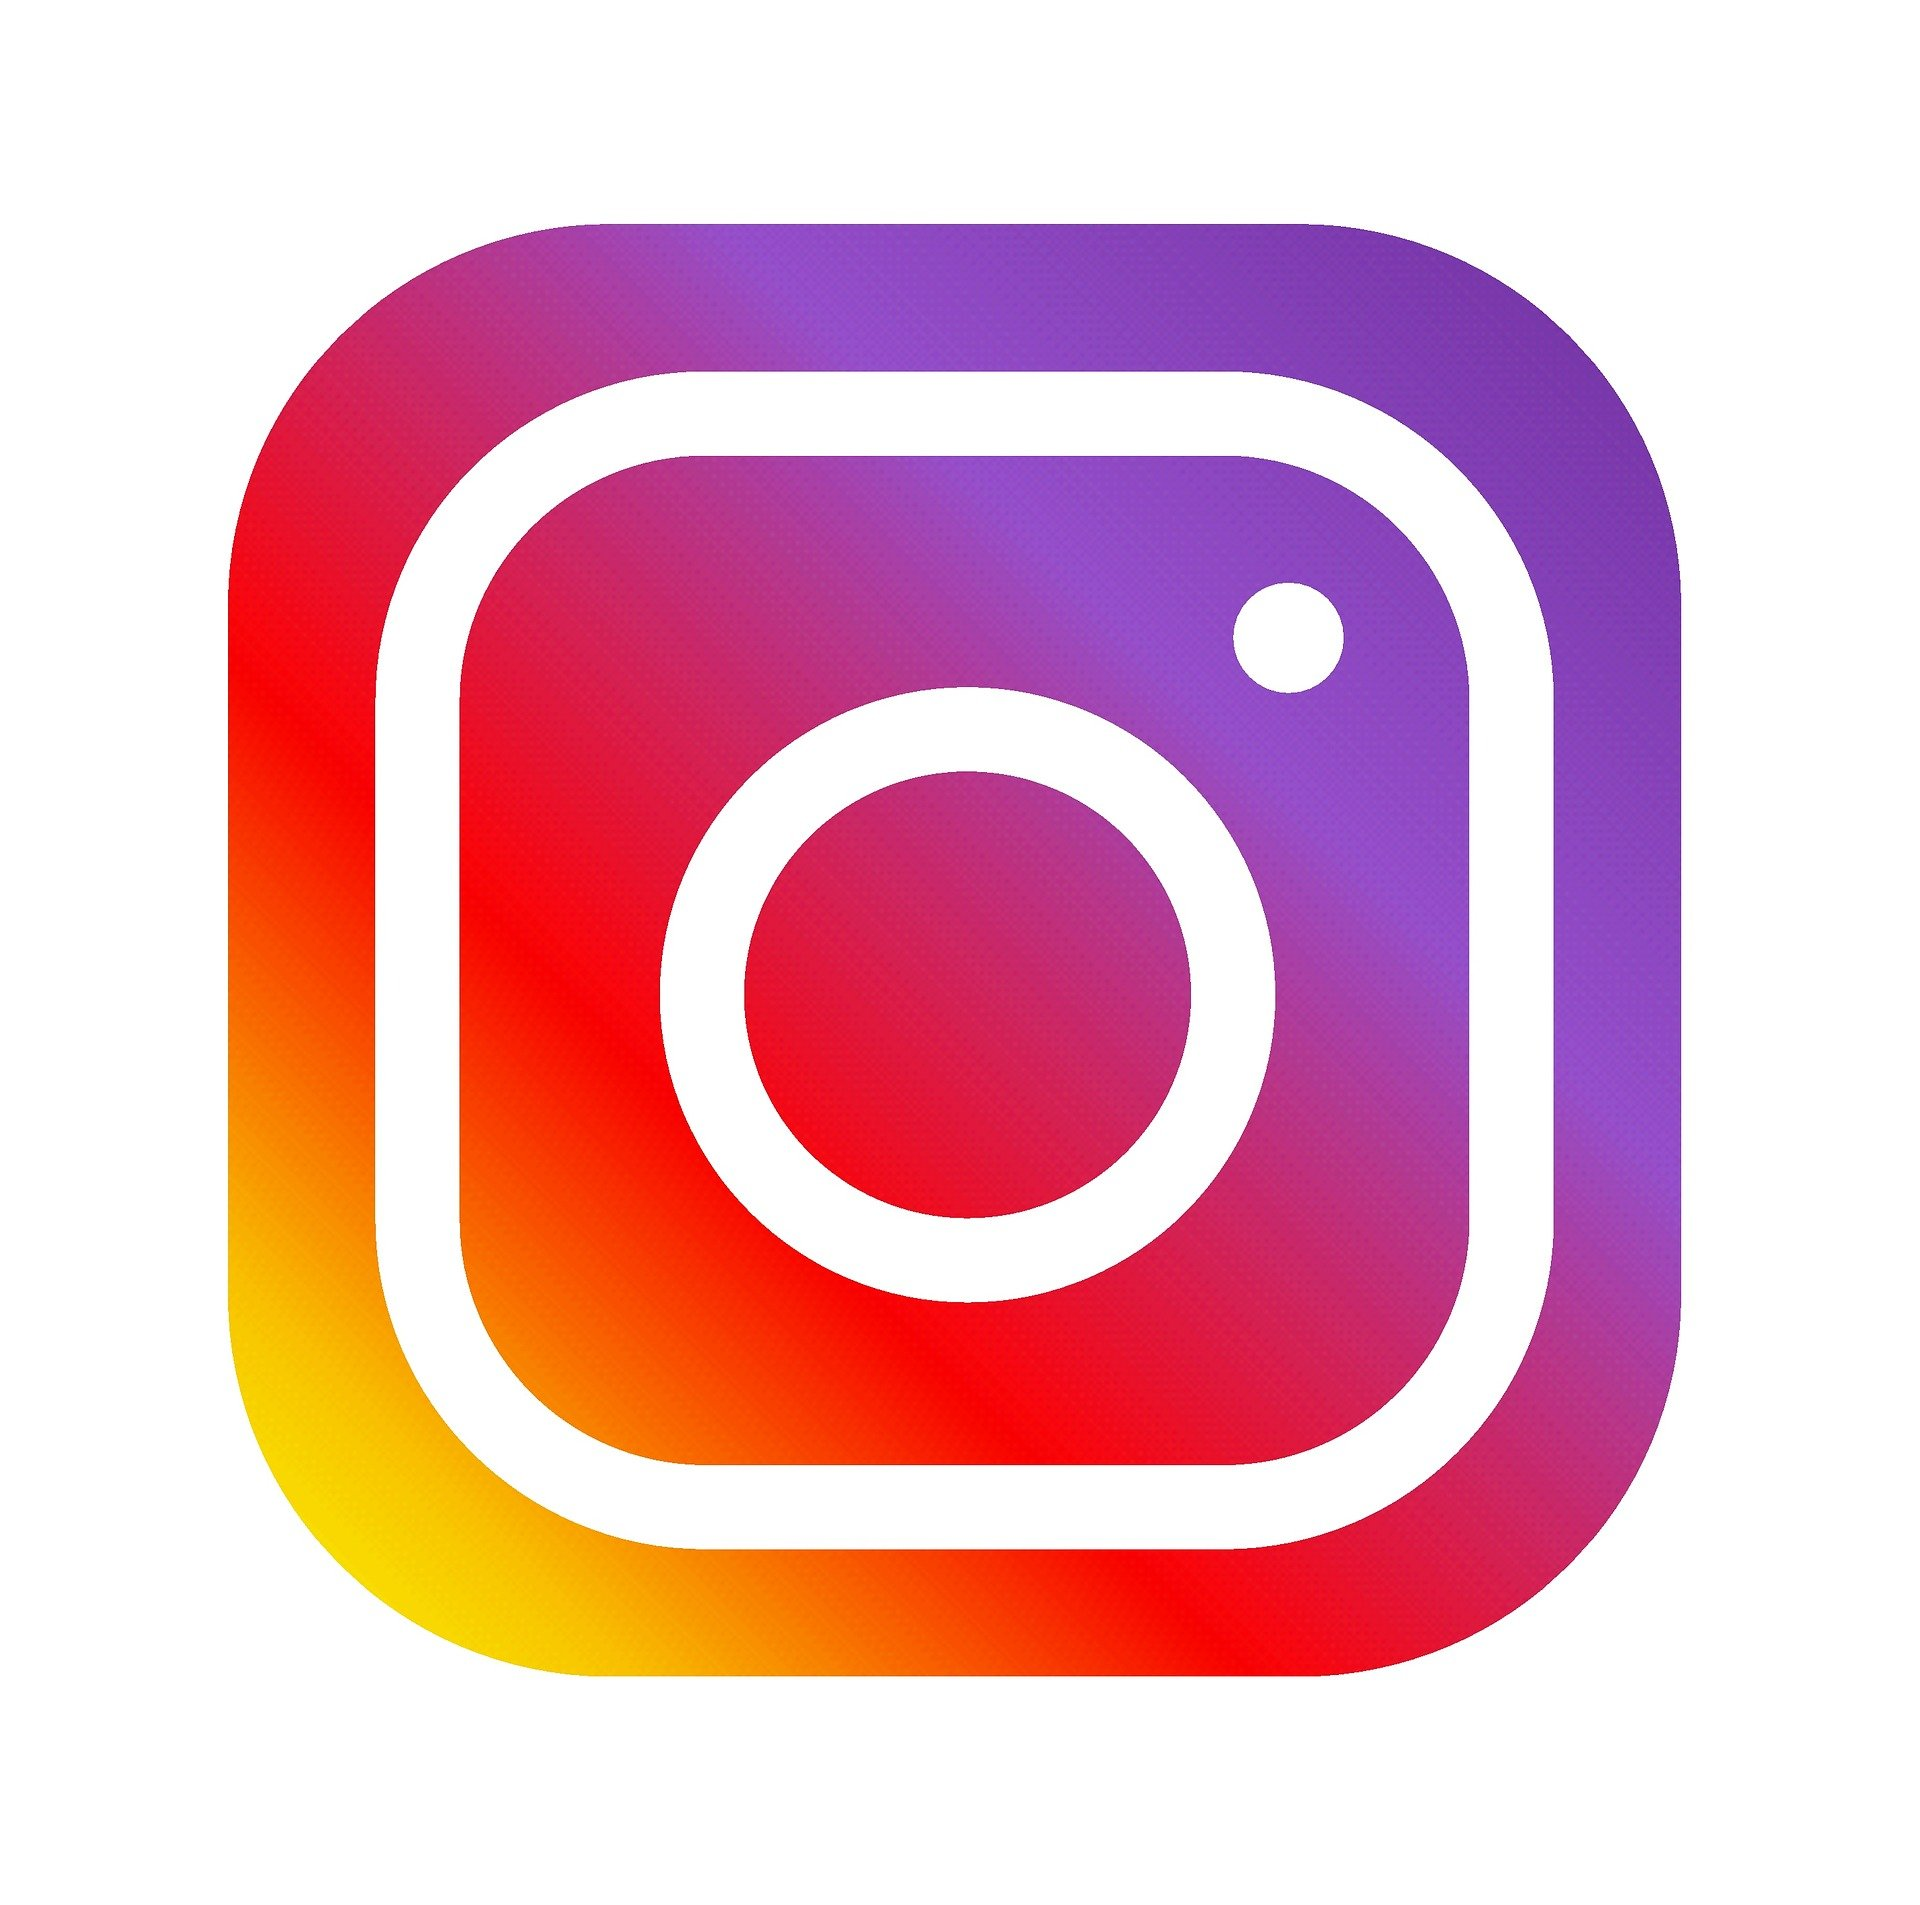 instagram-1581266_1920 (1)